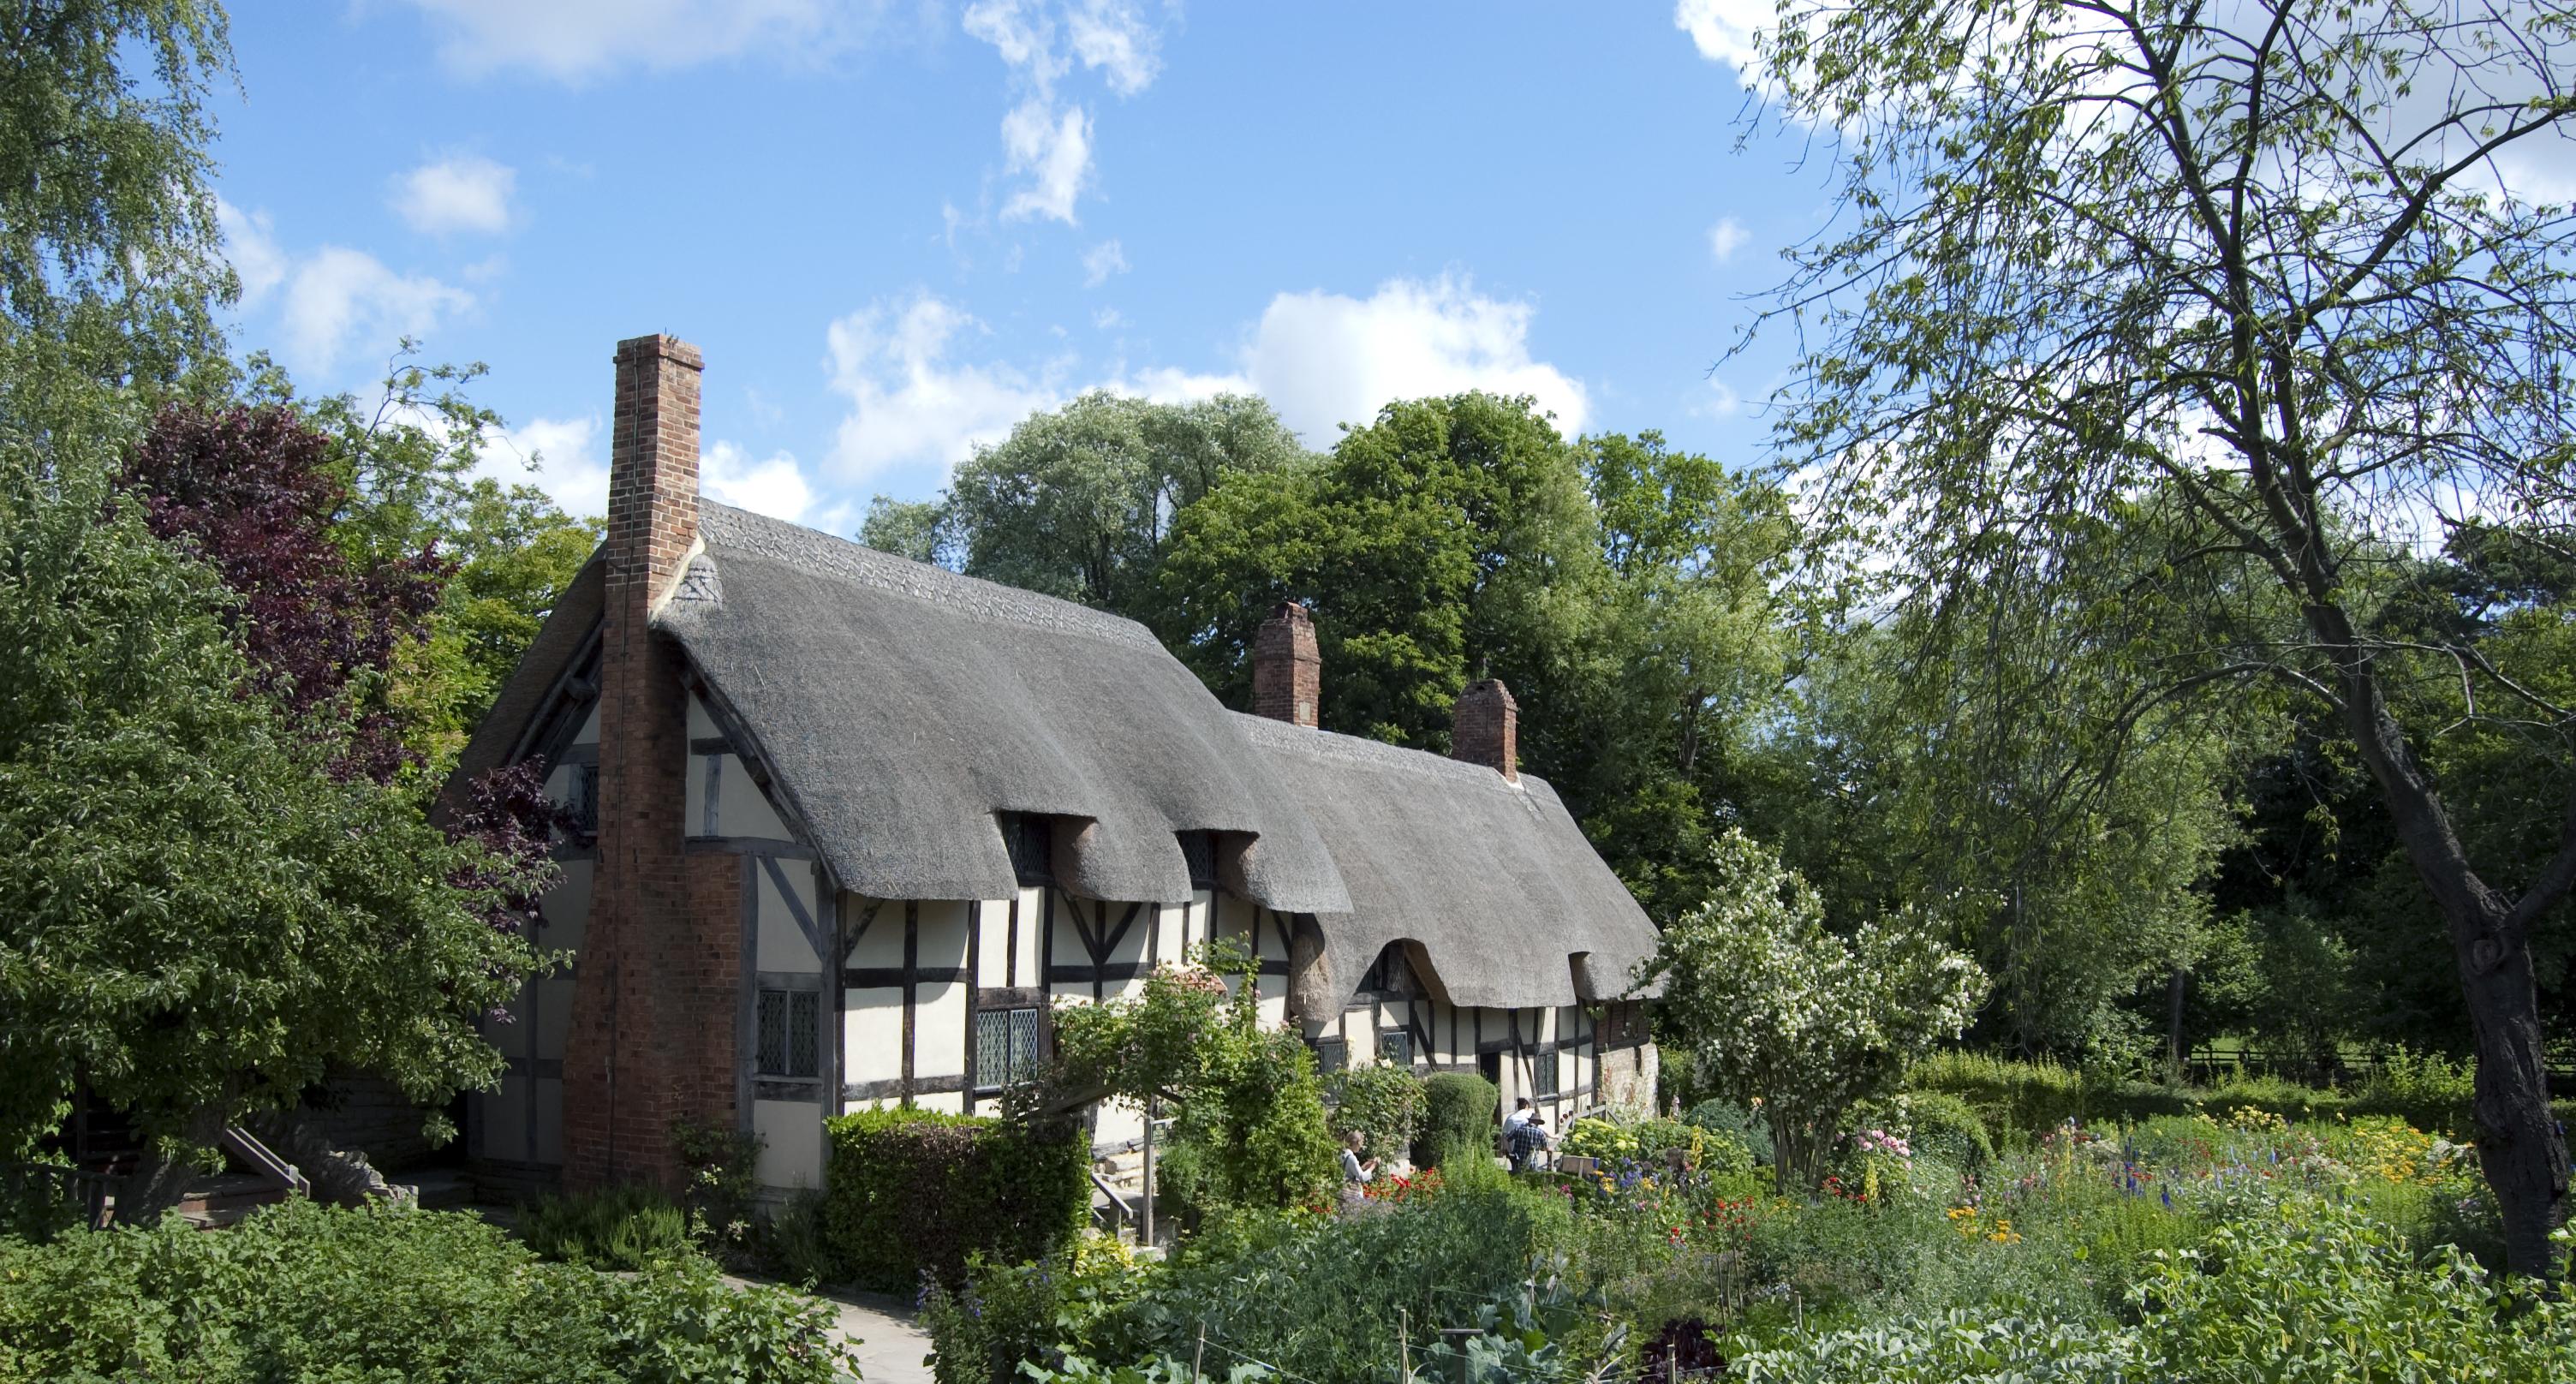 Image Ann Hathaway S Cottage